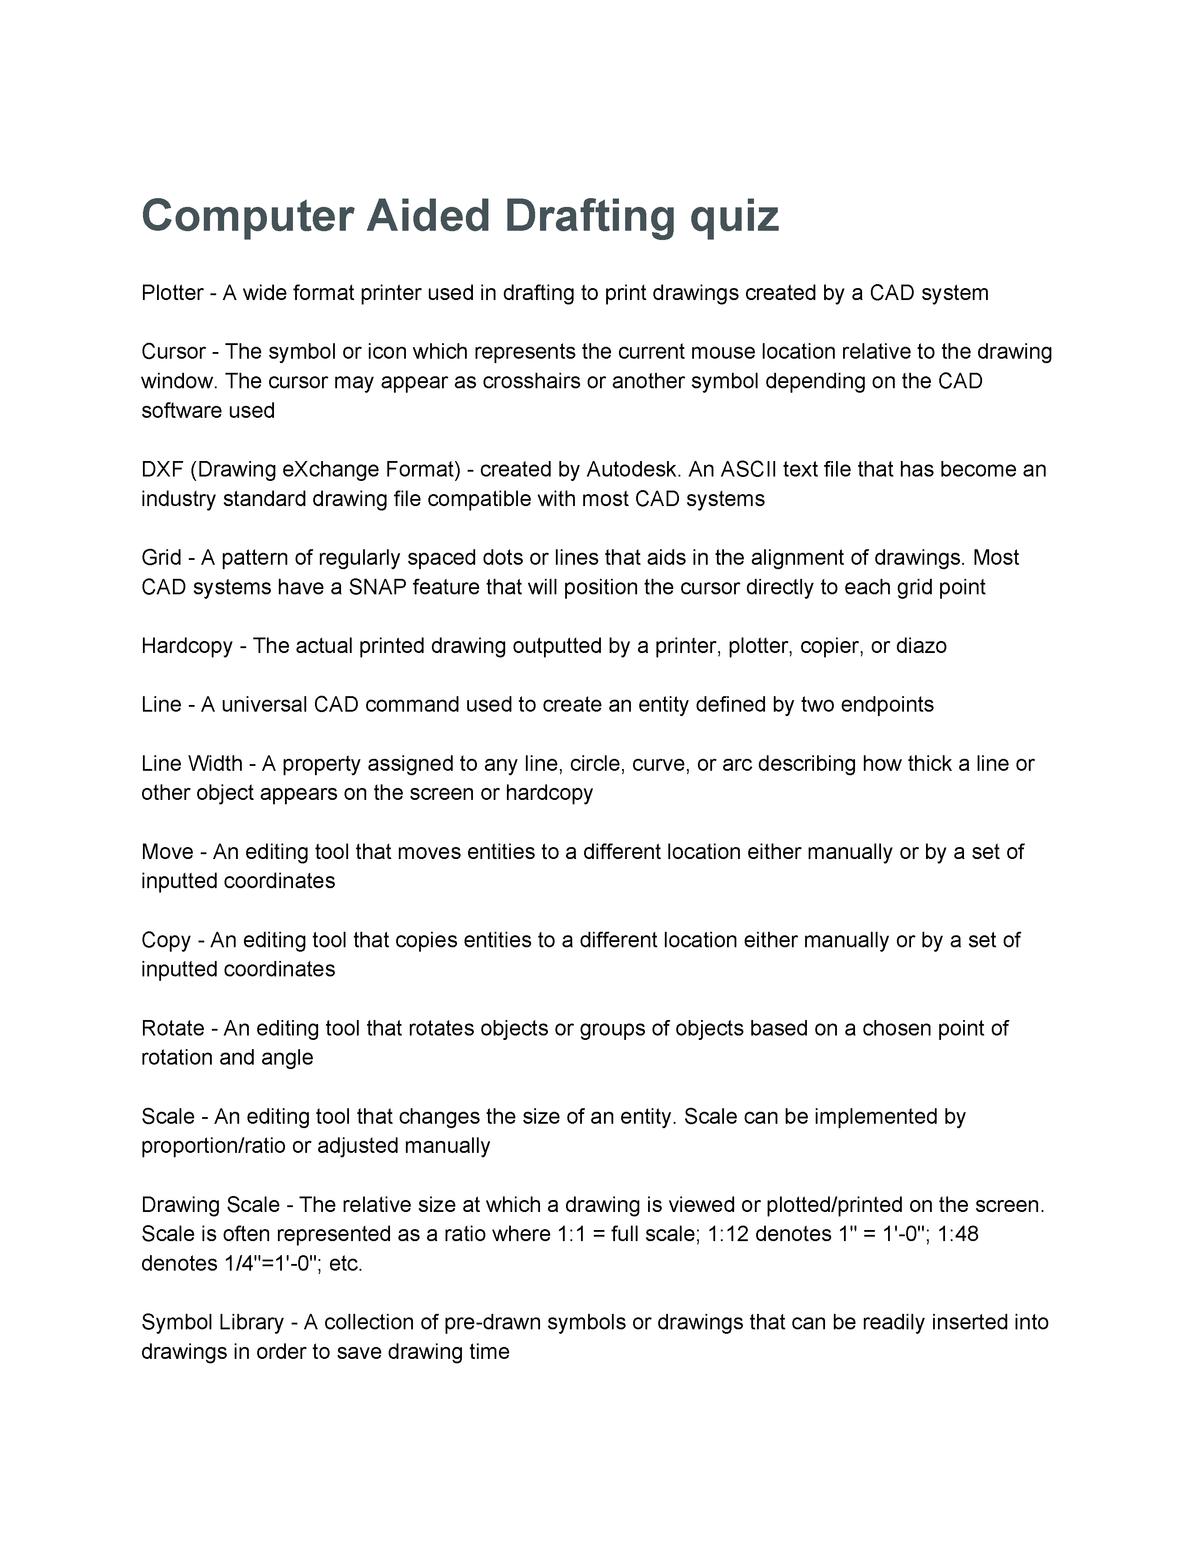 Tenta 2016 - ET 4330 :Advanced Computer-Aided Drafting - StuDocu